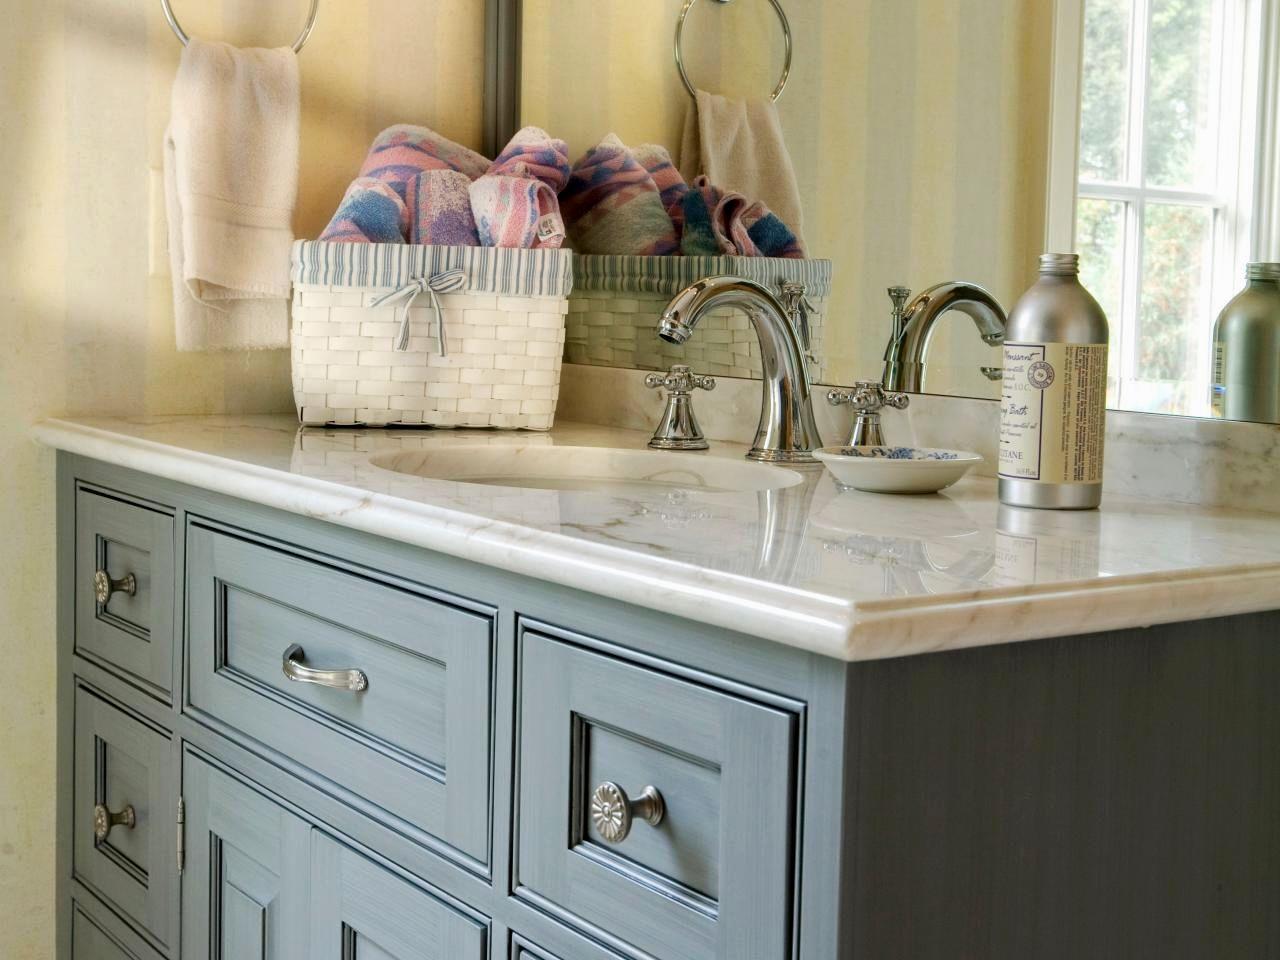 new white tile bathroom floor layout-Excellent White Tile Bathroom Floor Pattern